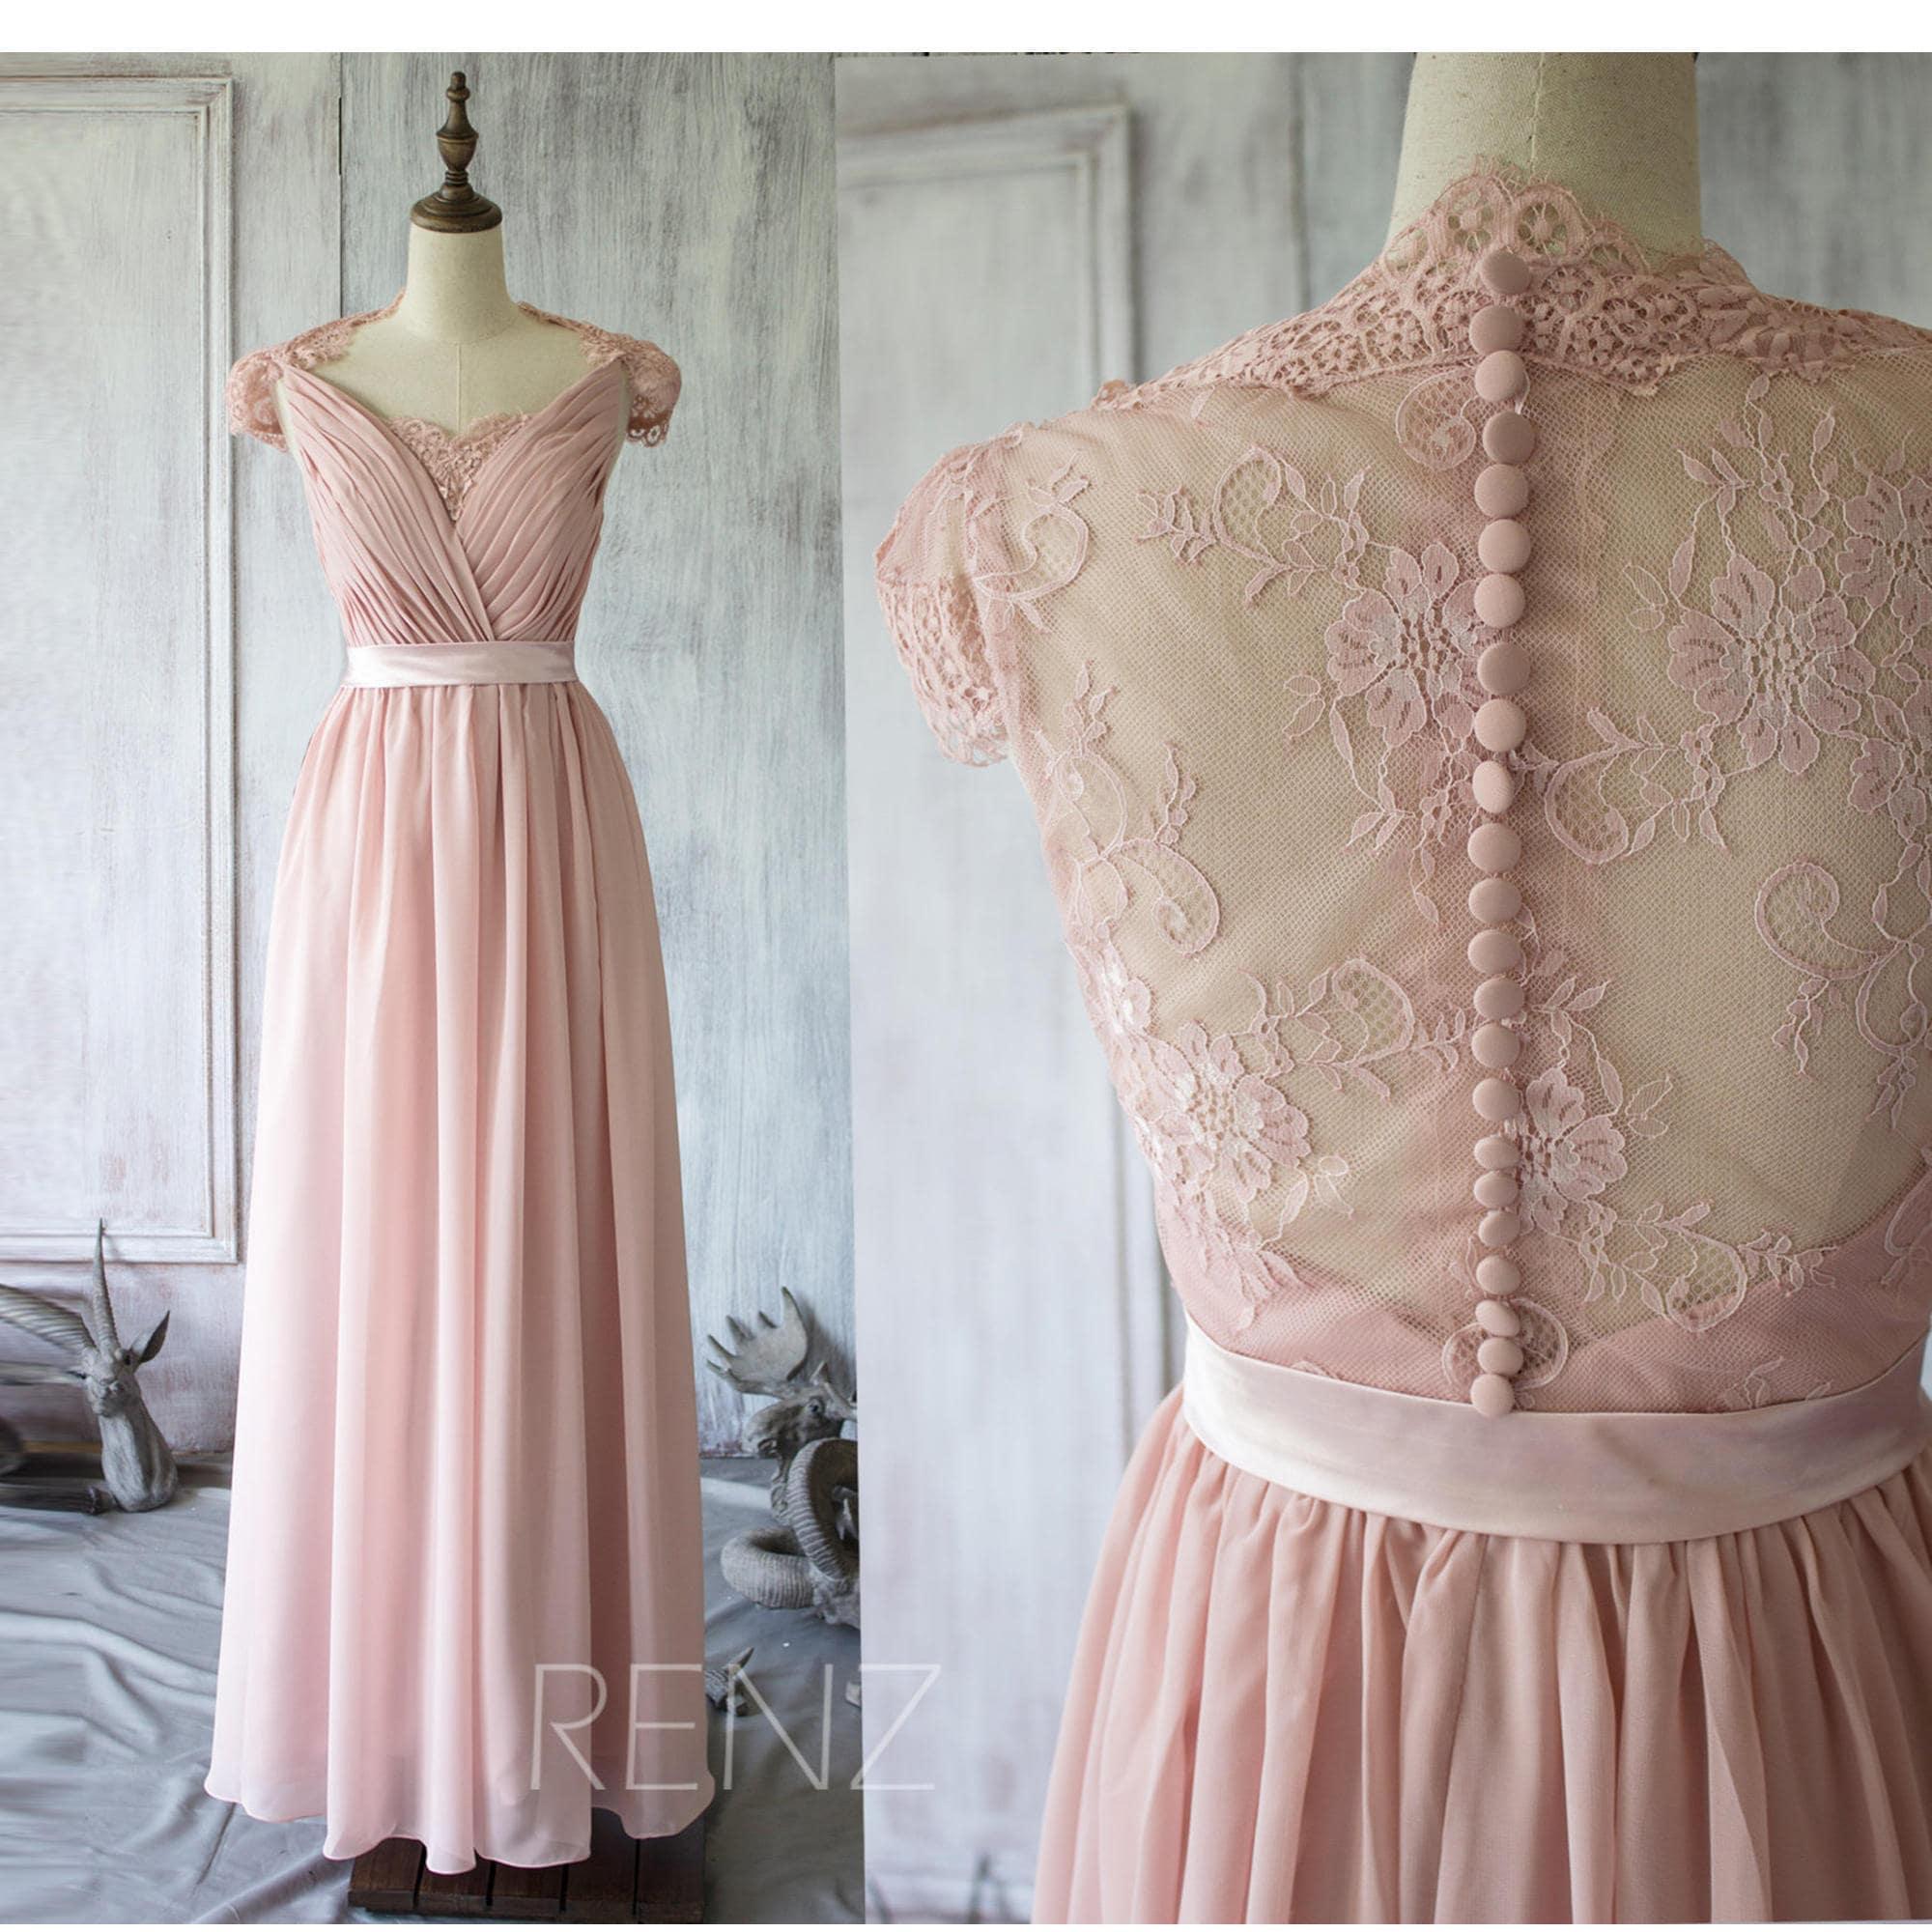 Blush chiffon lace bridesmaid dress cap sleeve wedding dress zoom ombrellifo Choice Image